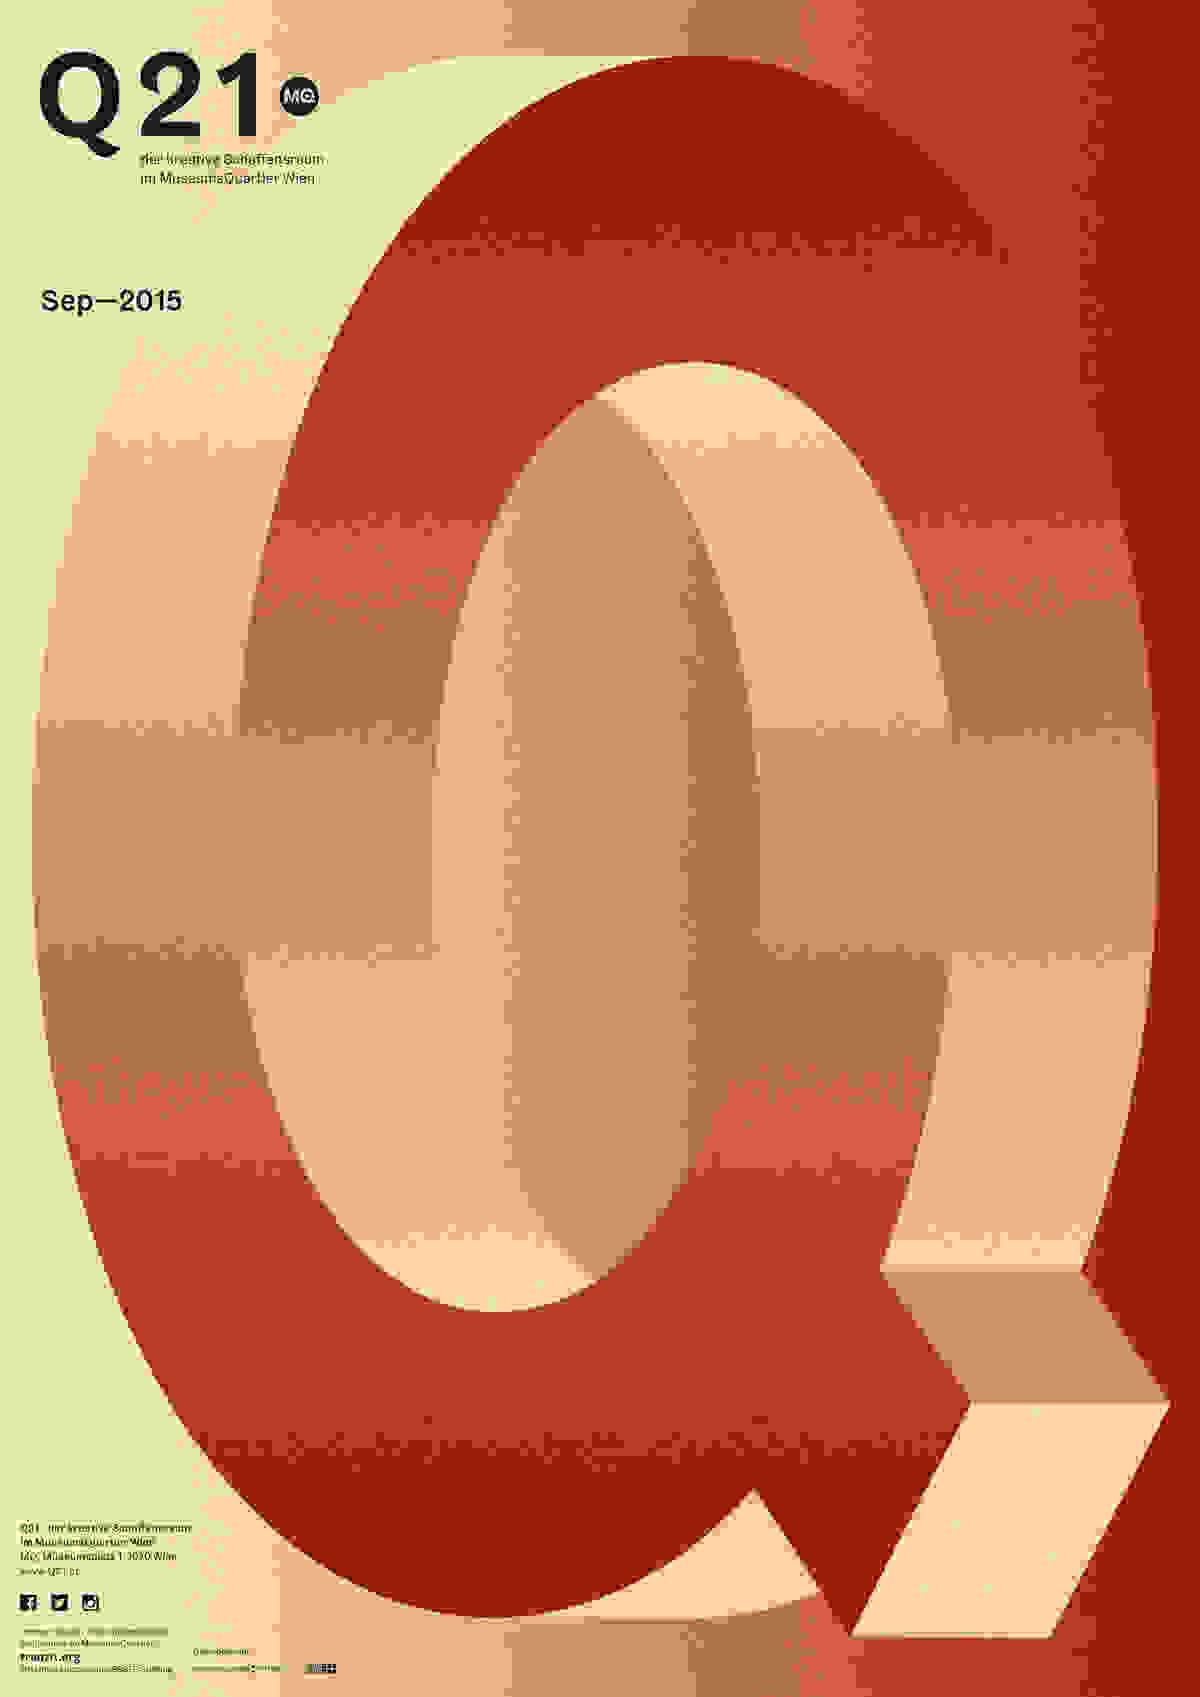 Q21 Plakat 2015 SEP 1200px